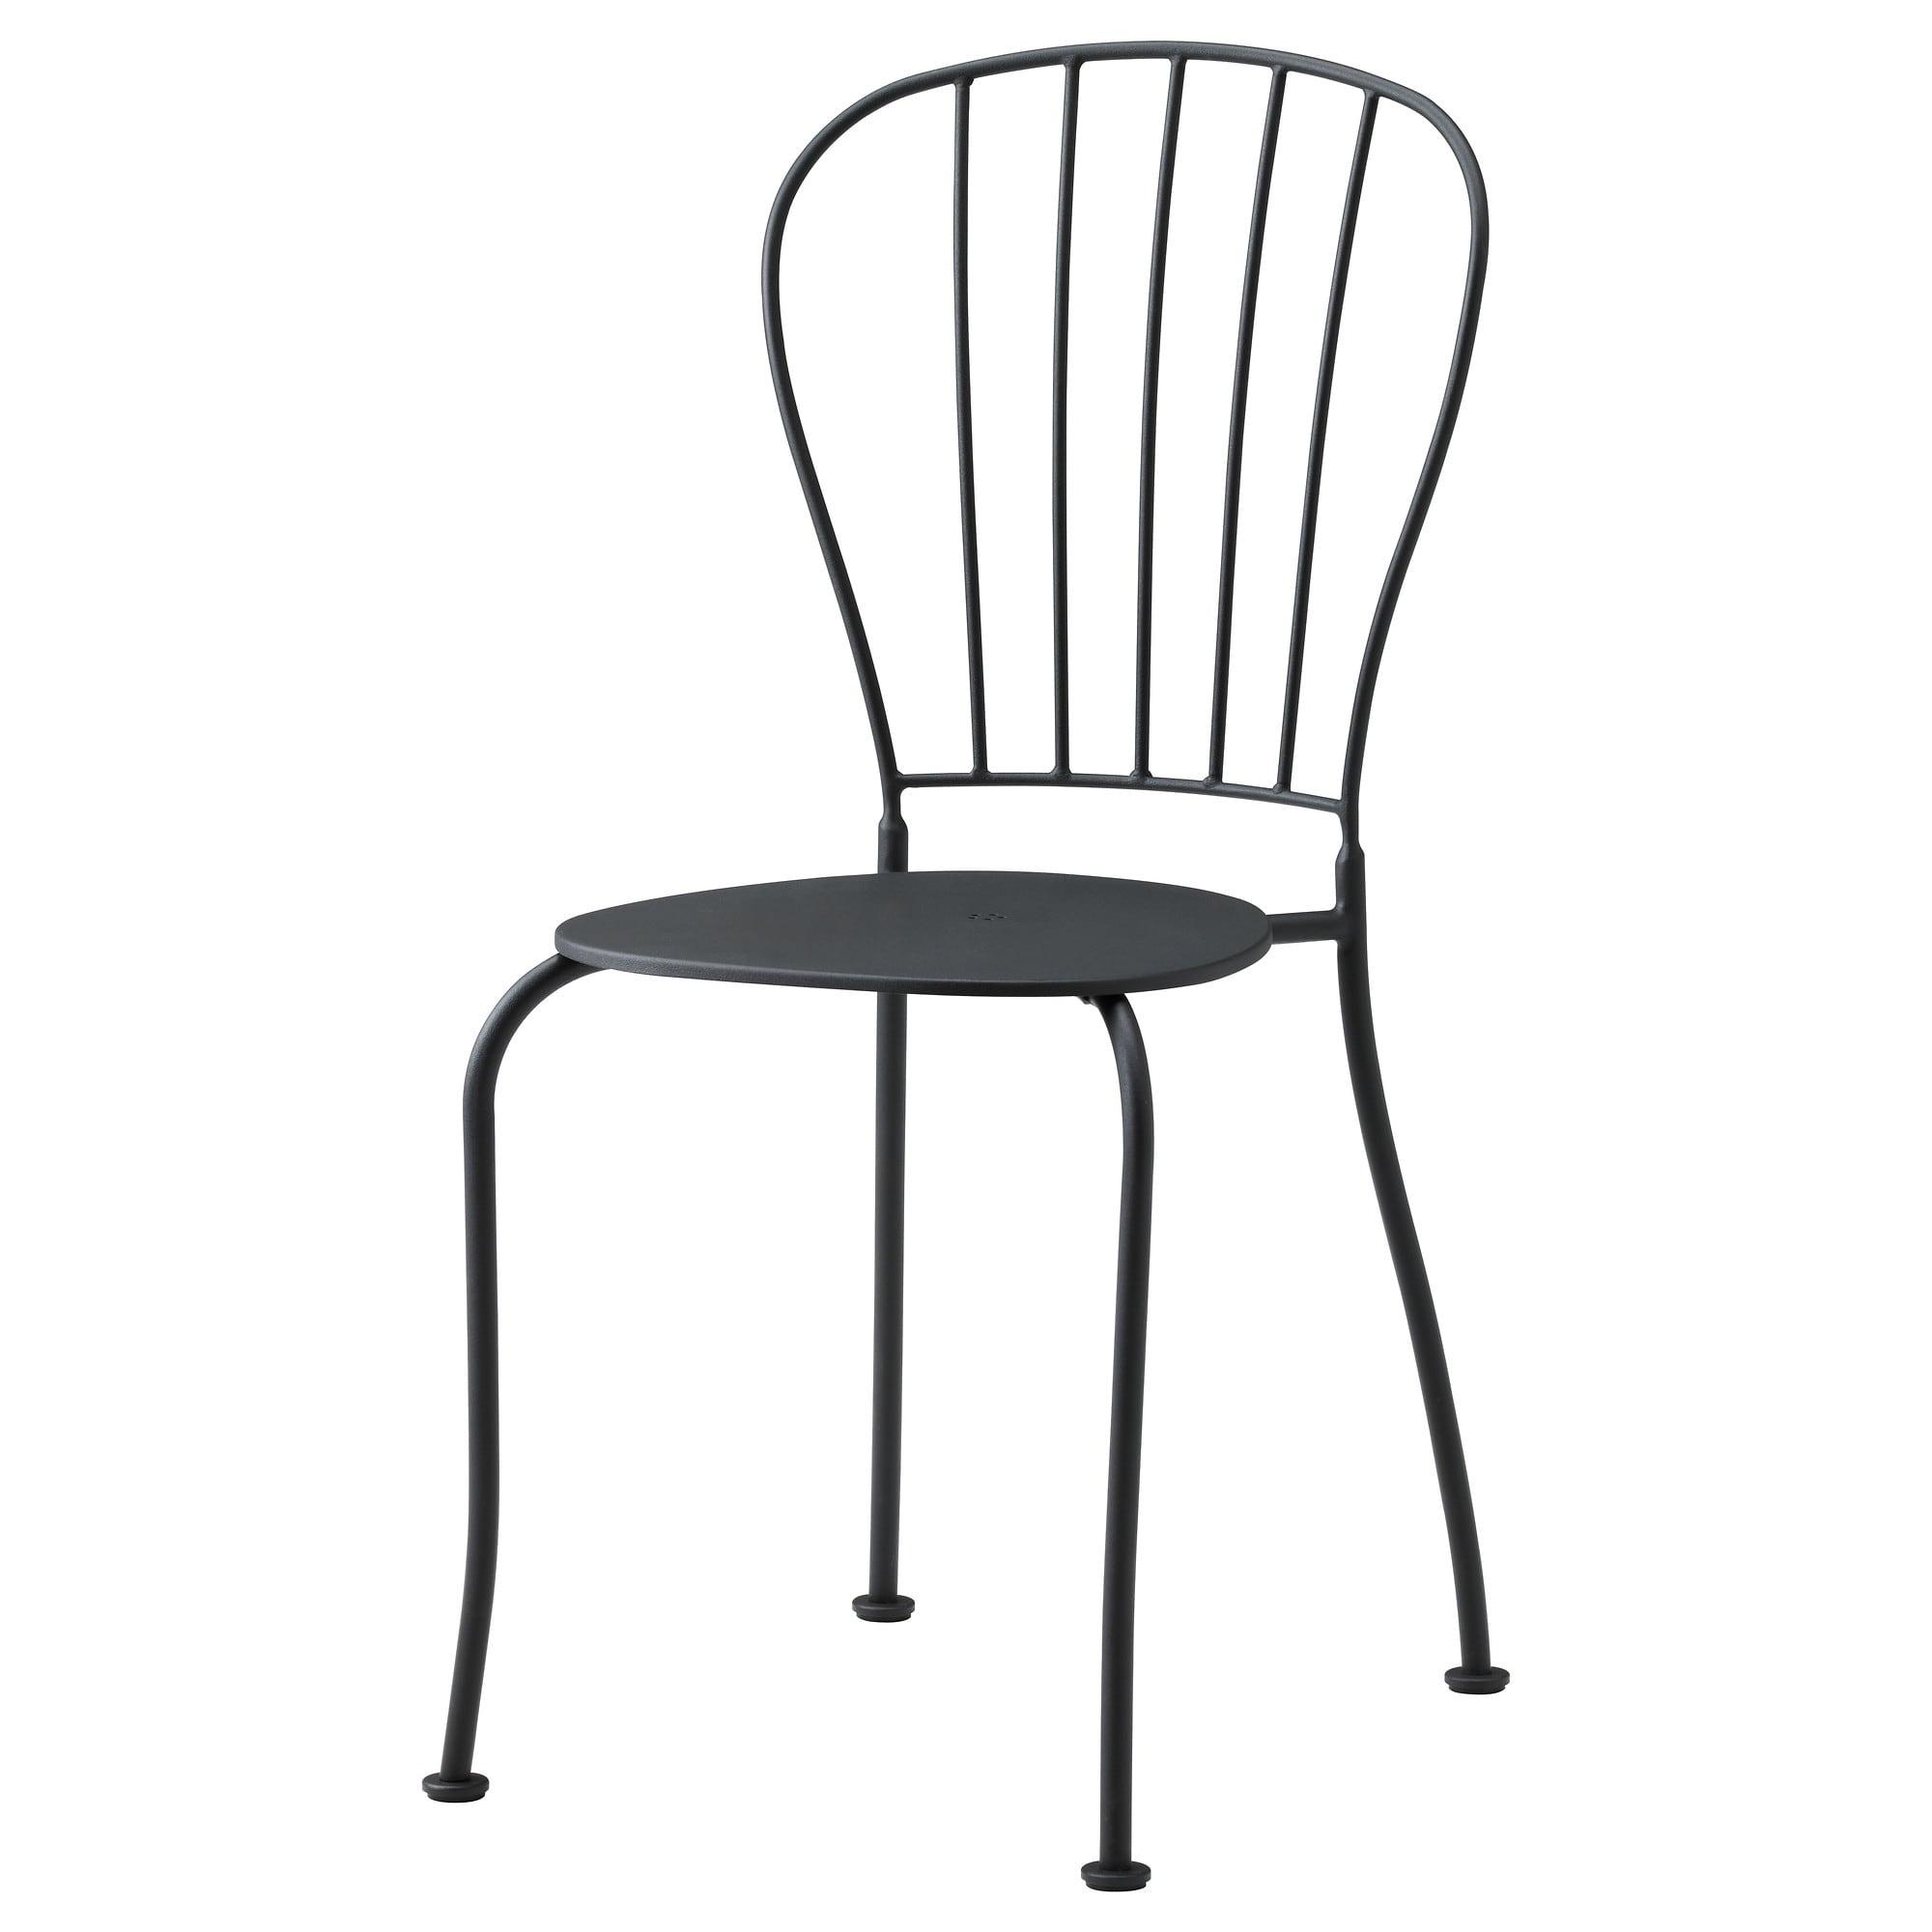 ikea tavolini da esterno ikea catalogo tavoli da giardino Lacko Chair Outdoor Gray Ikea Tavolo E Sedie Da Giardino Sedia Ikea Sala Da Pranzo Ikea